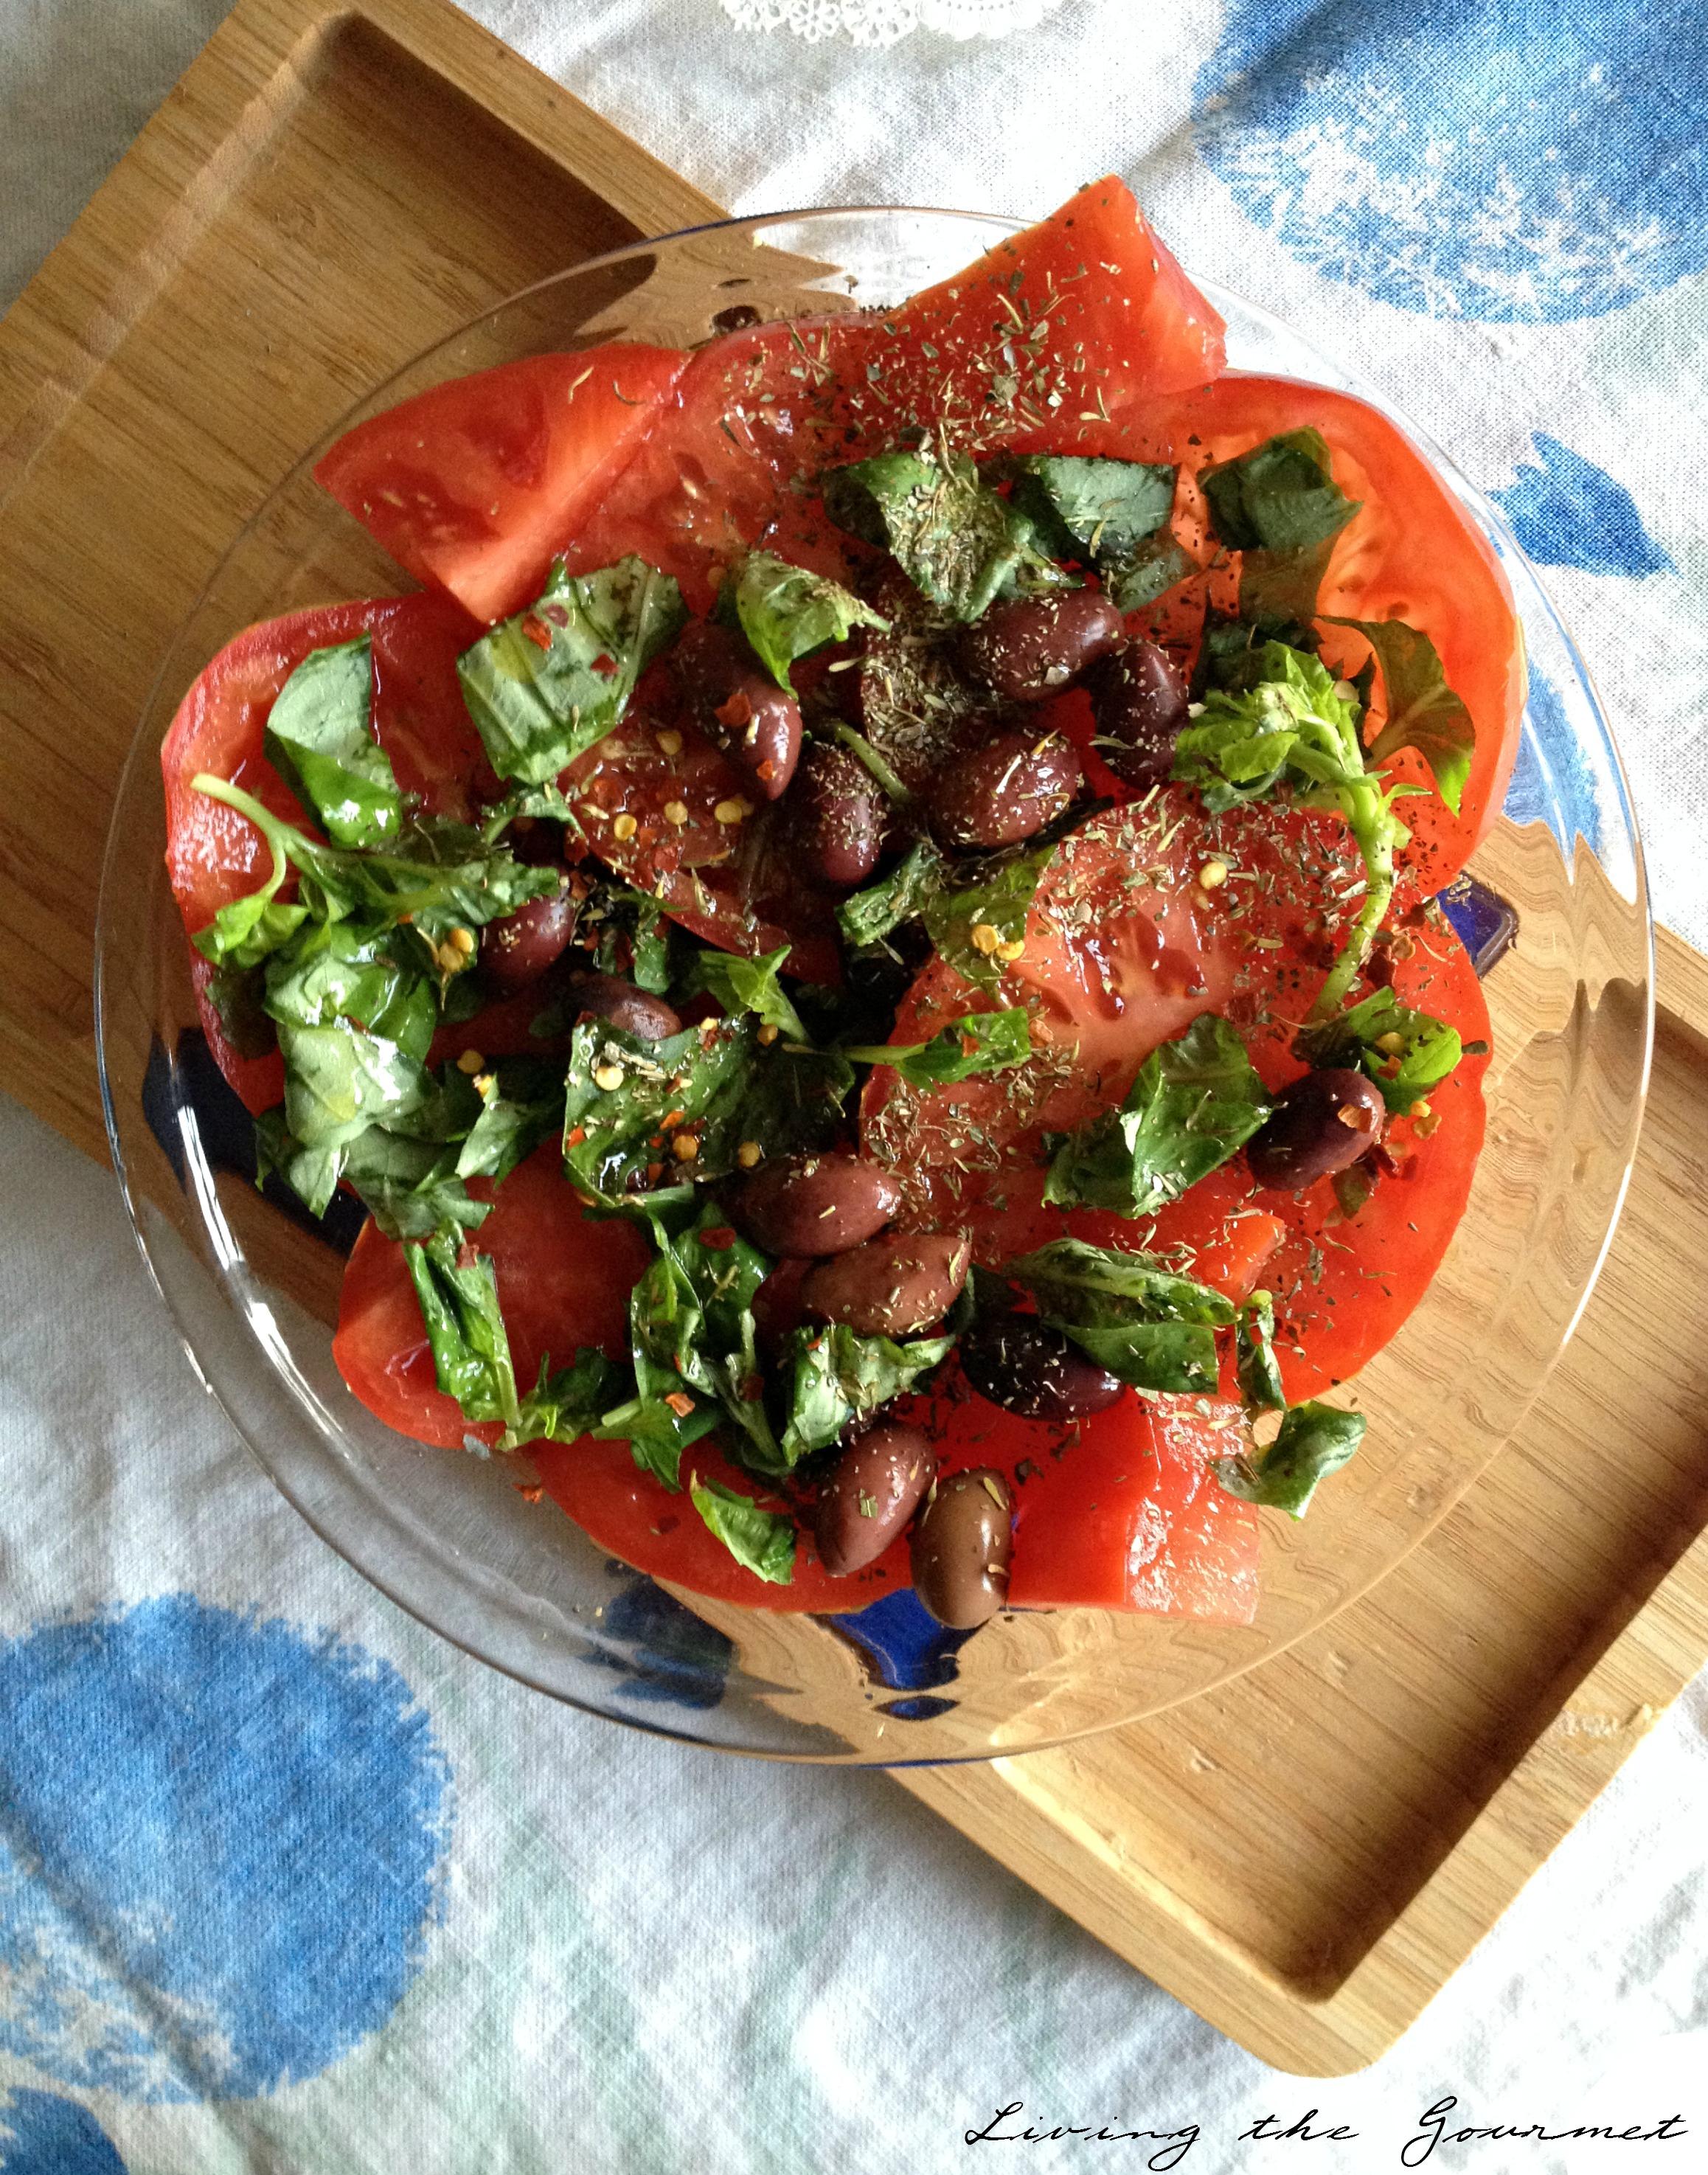 Living the Gourmet:  Pomodoro & Basilico Insalata | #SiWhatsNext #CG